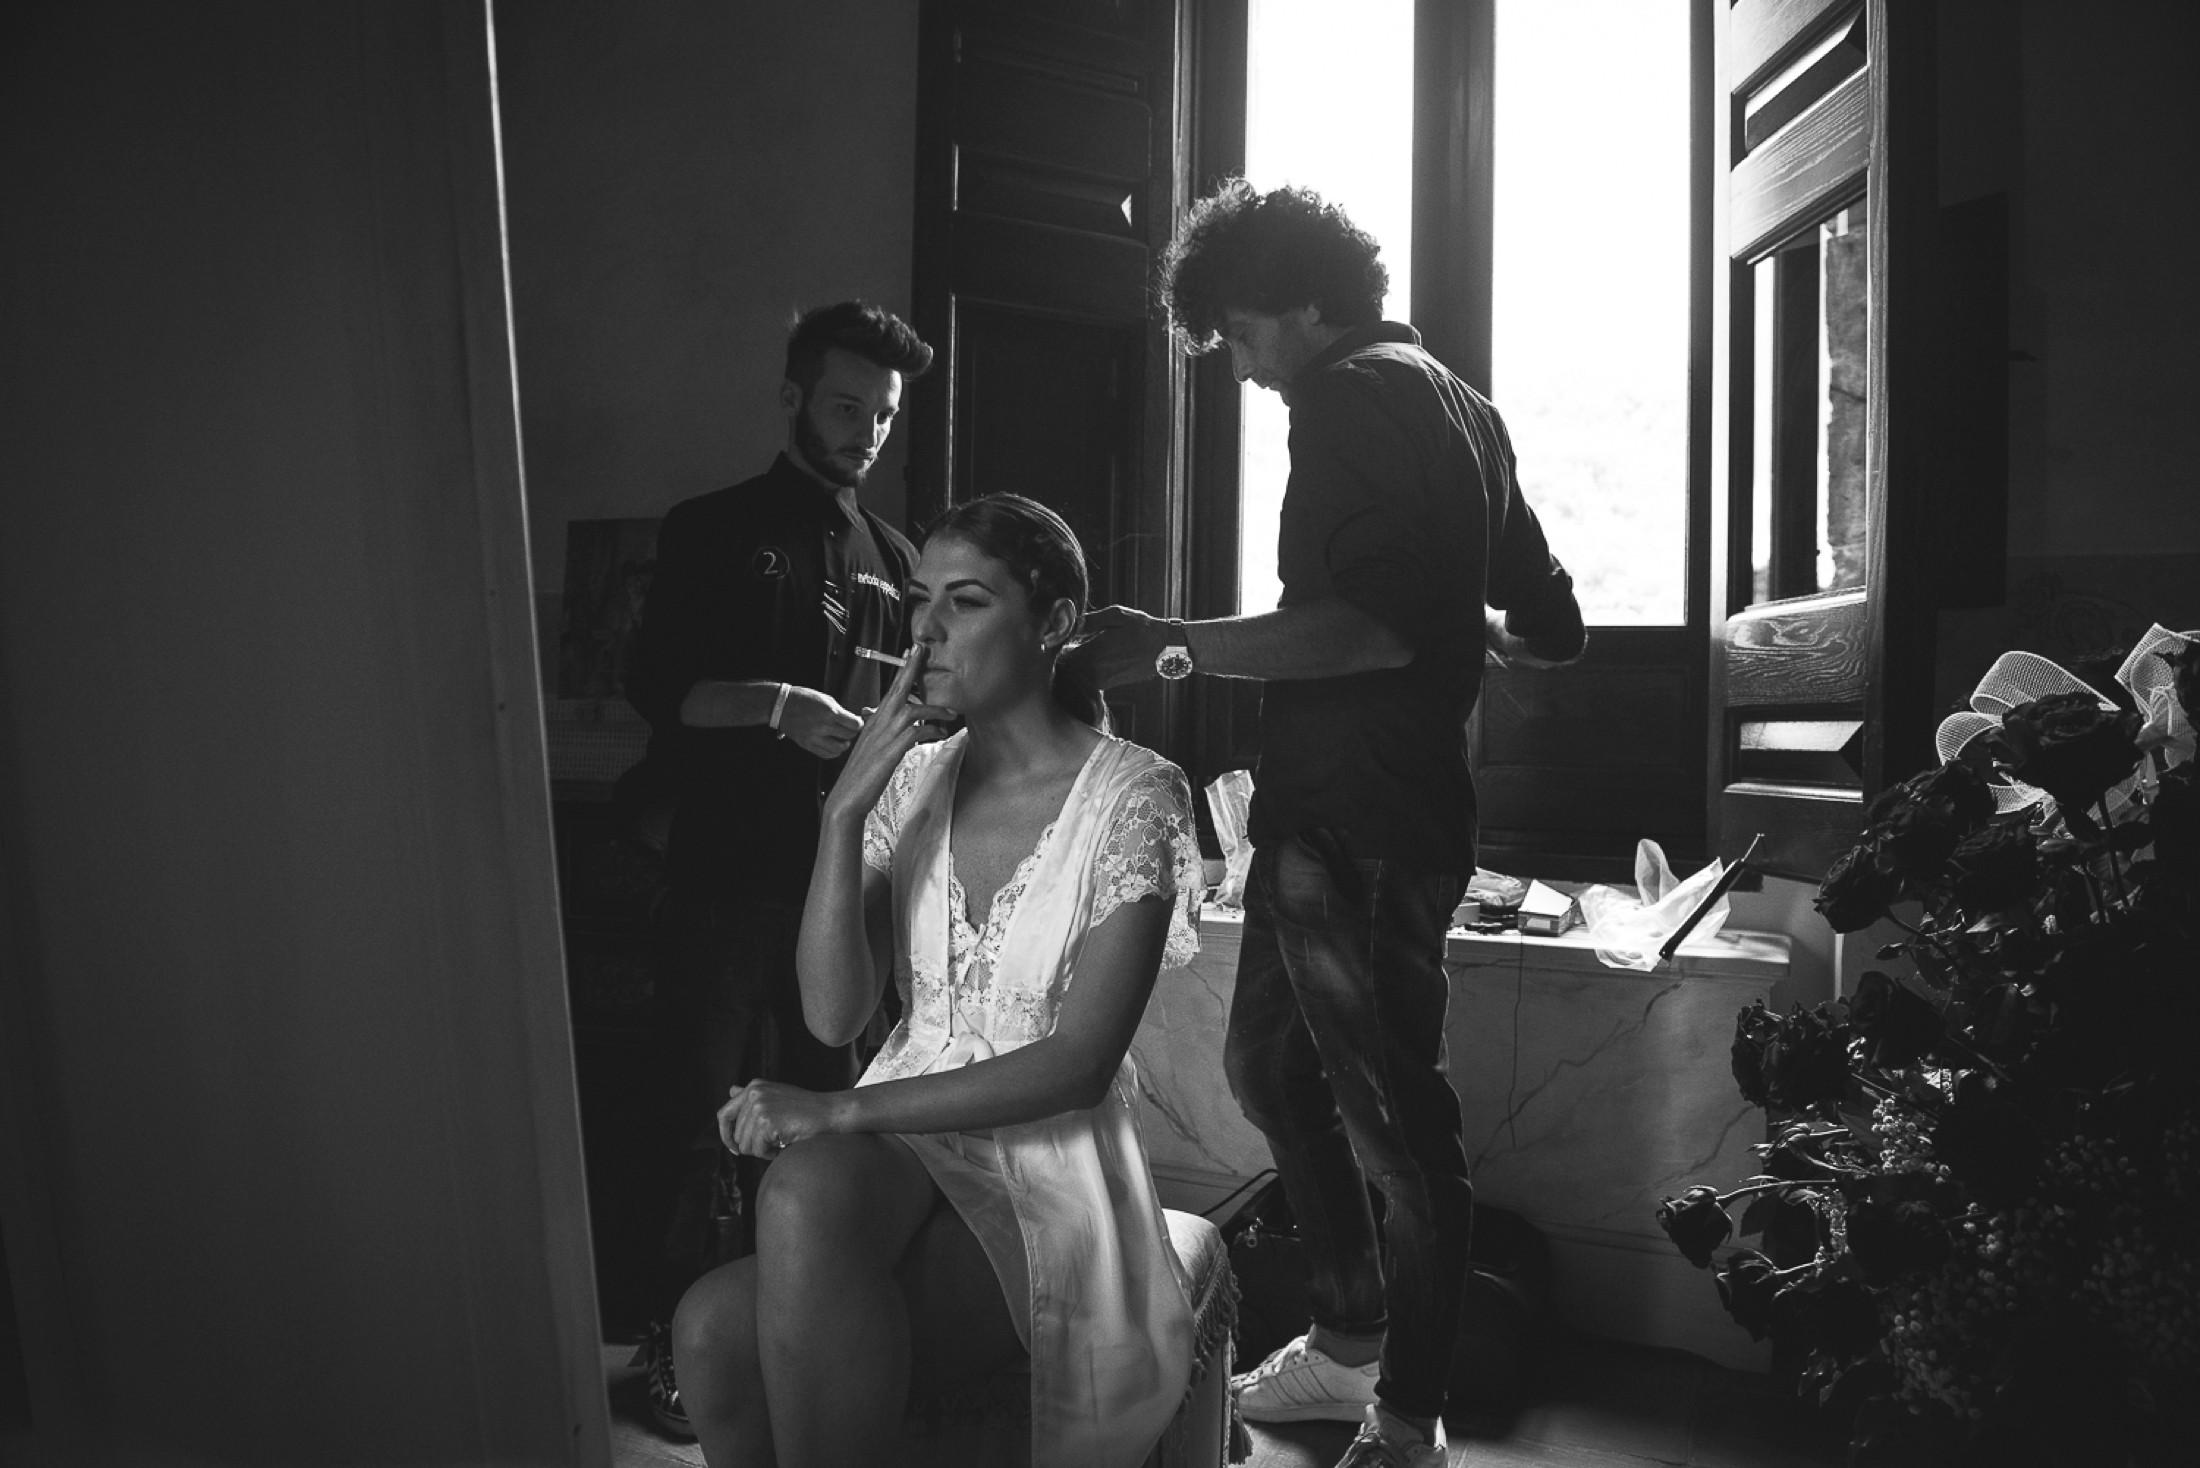 adriana alfano the bride smokes a cigarette during the make up